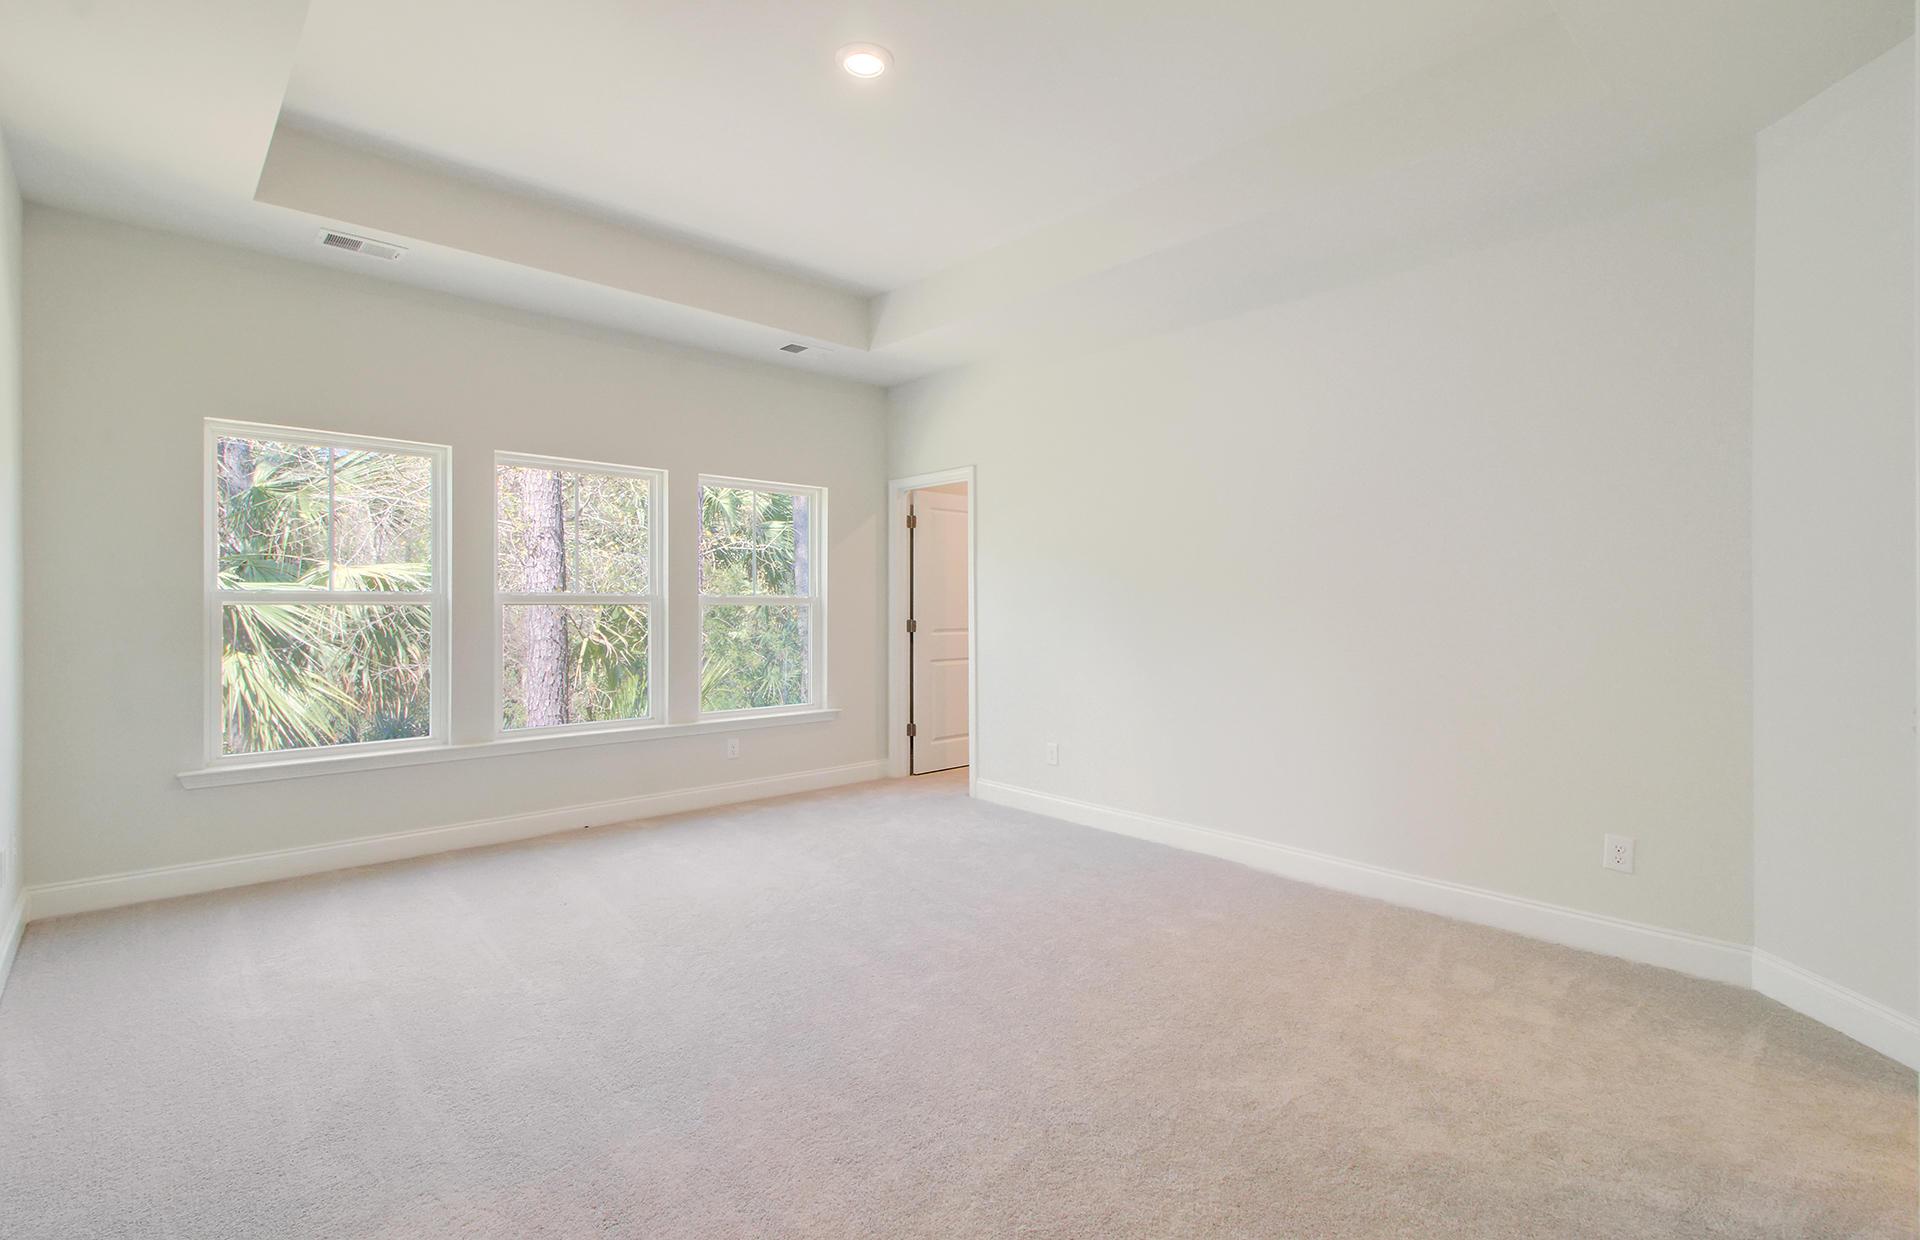 Park West Homes For Sale - 3062 Rice Field, Mount Pleasant, SC - 4